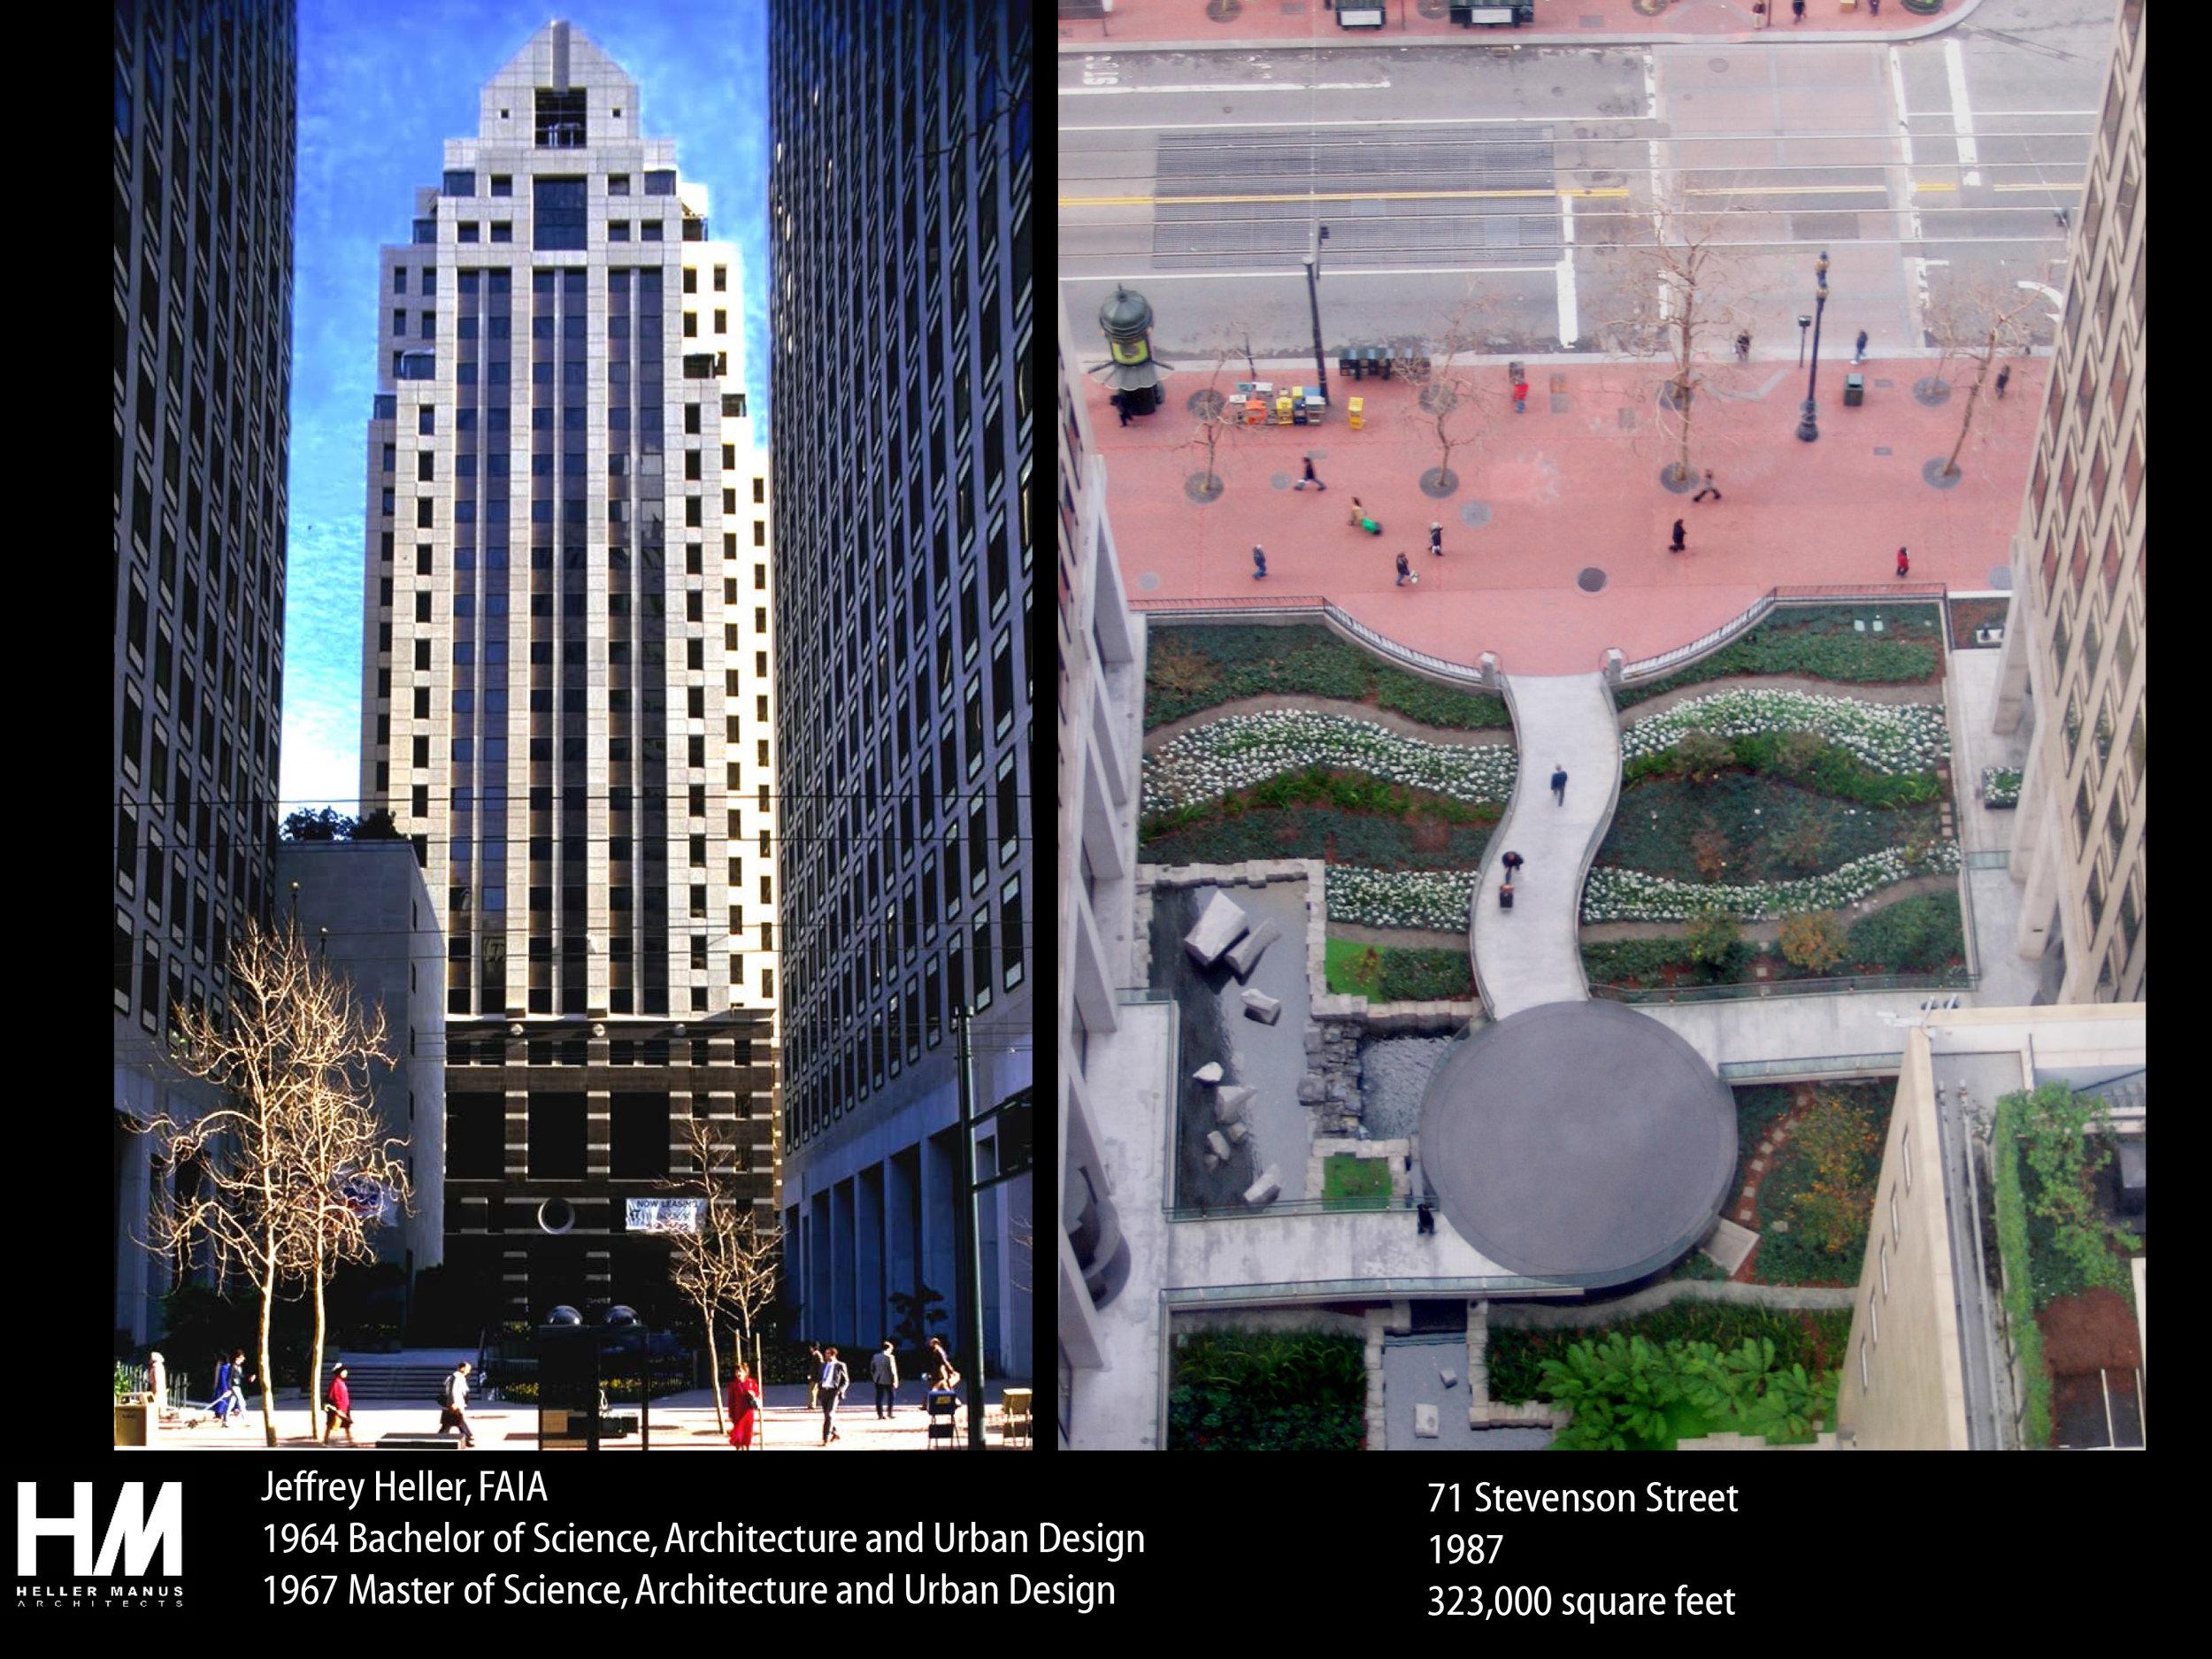 MIT ARCHITECTURE 150 SAN FRANCISCO SLIDESHOW-73 copy.jpg